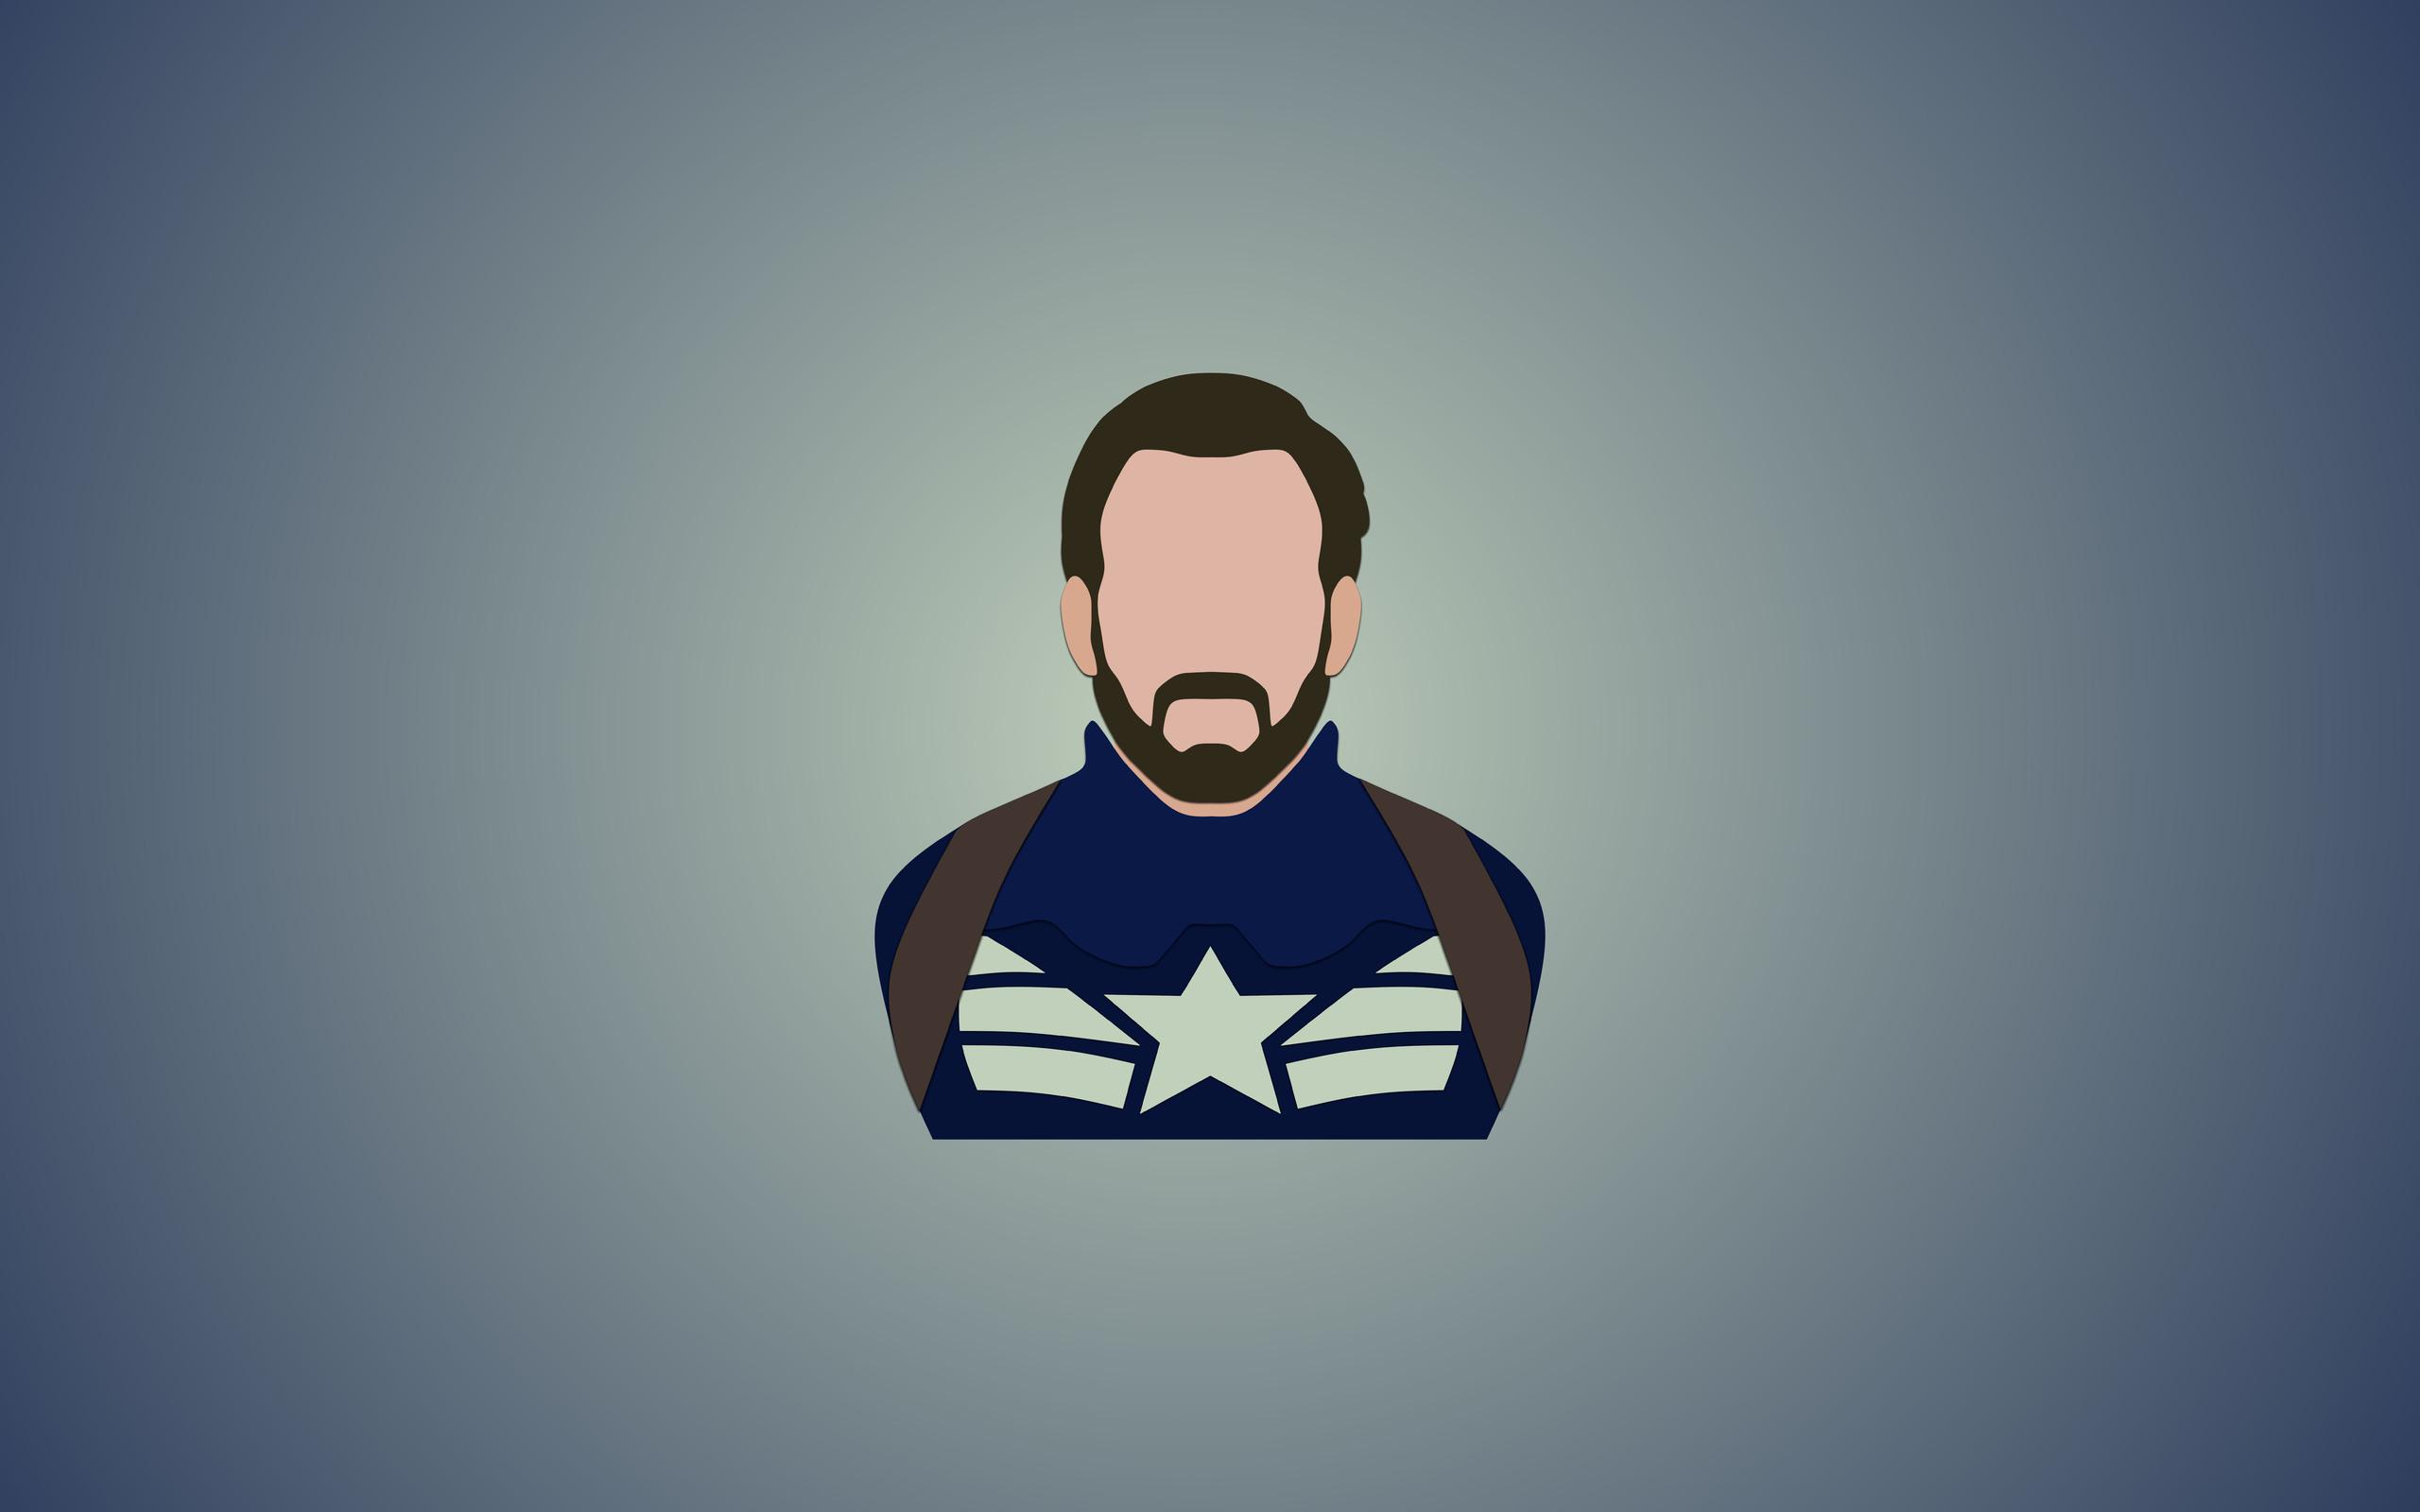 captain-america-minimalism-12k-gs.jpg